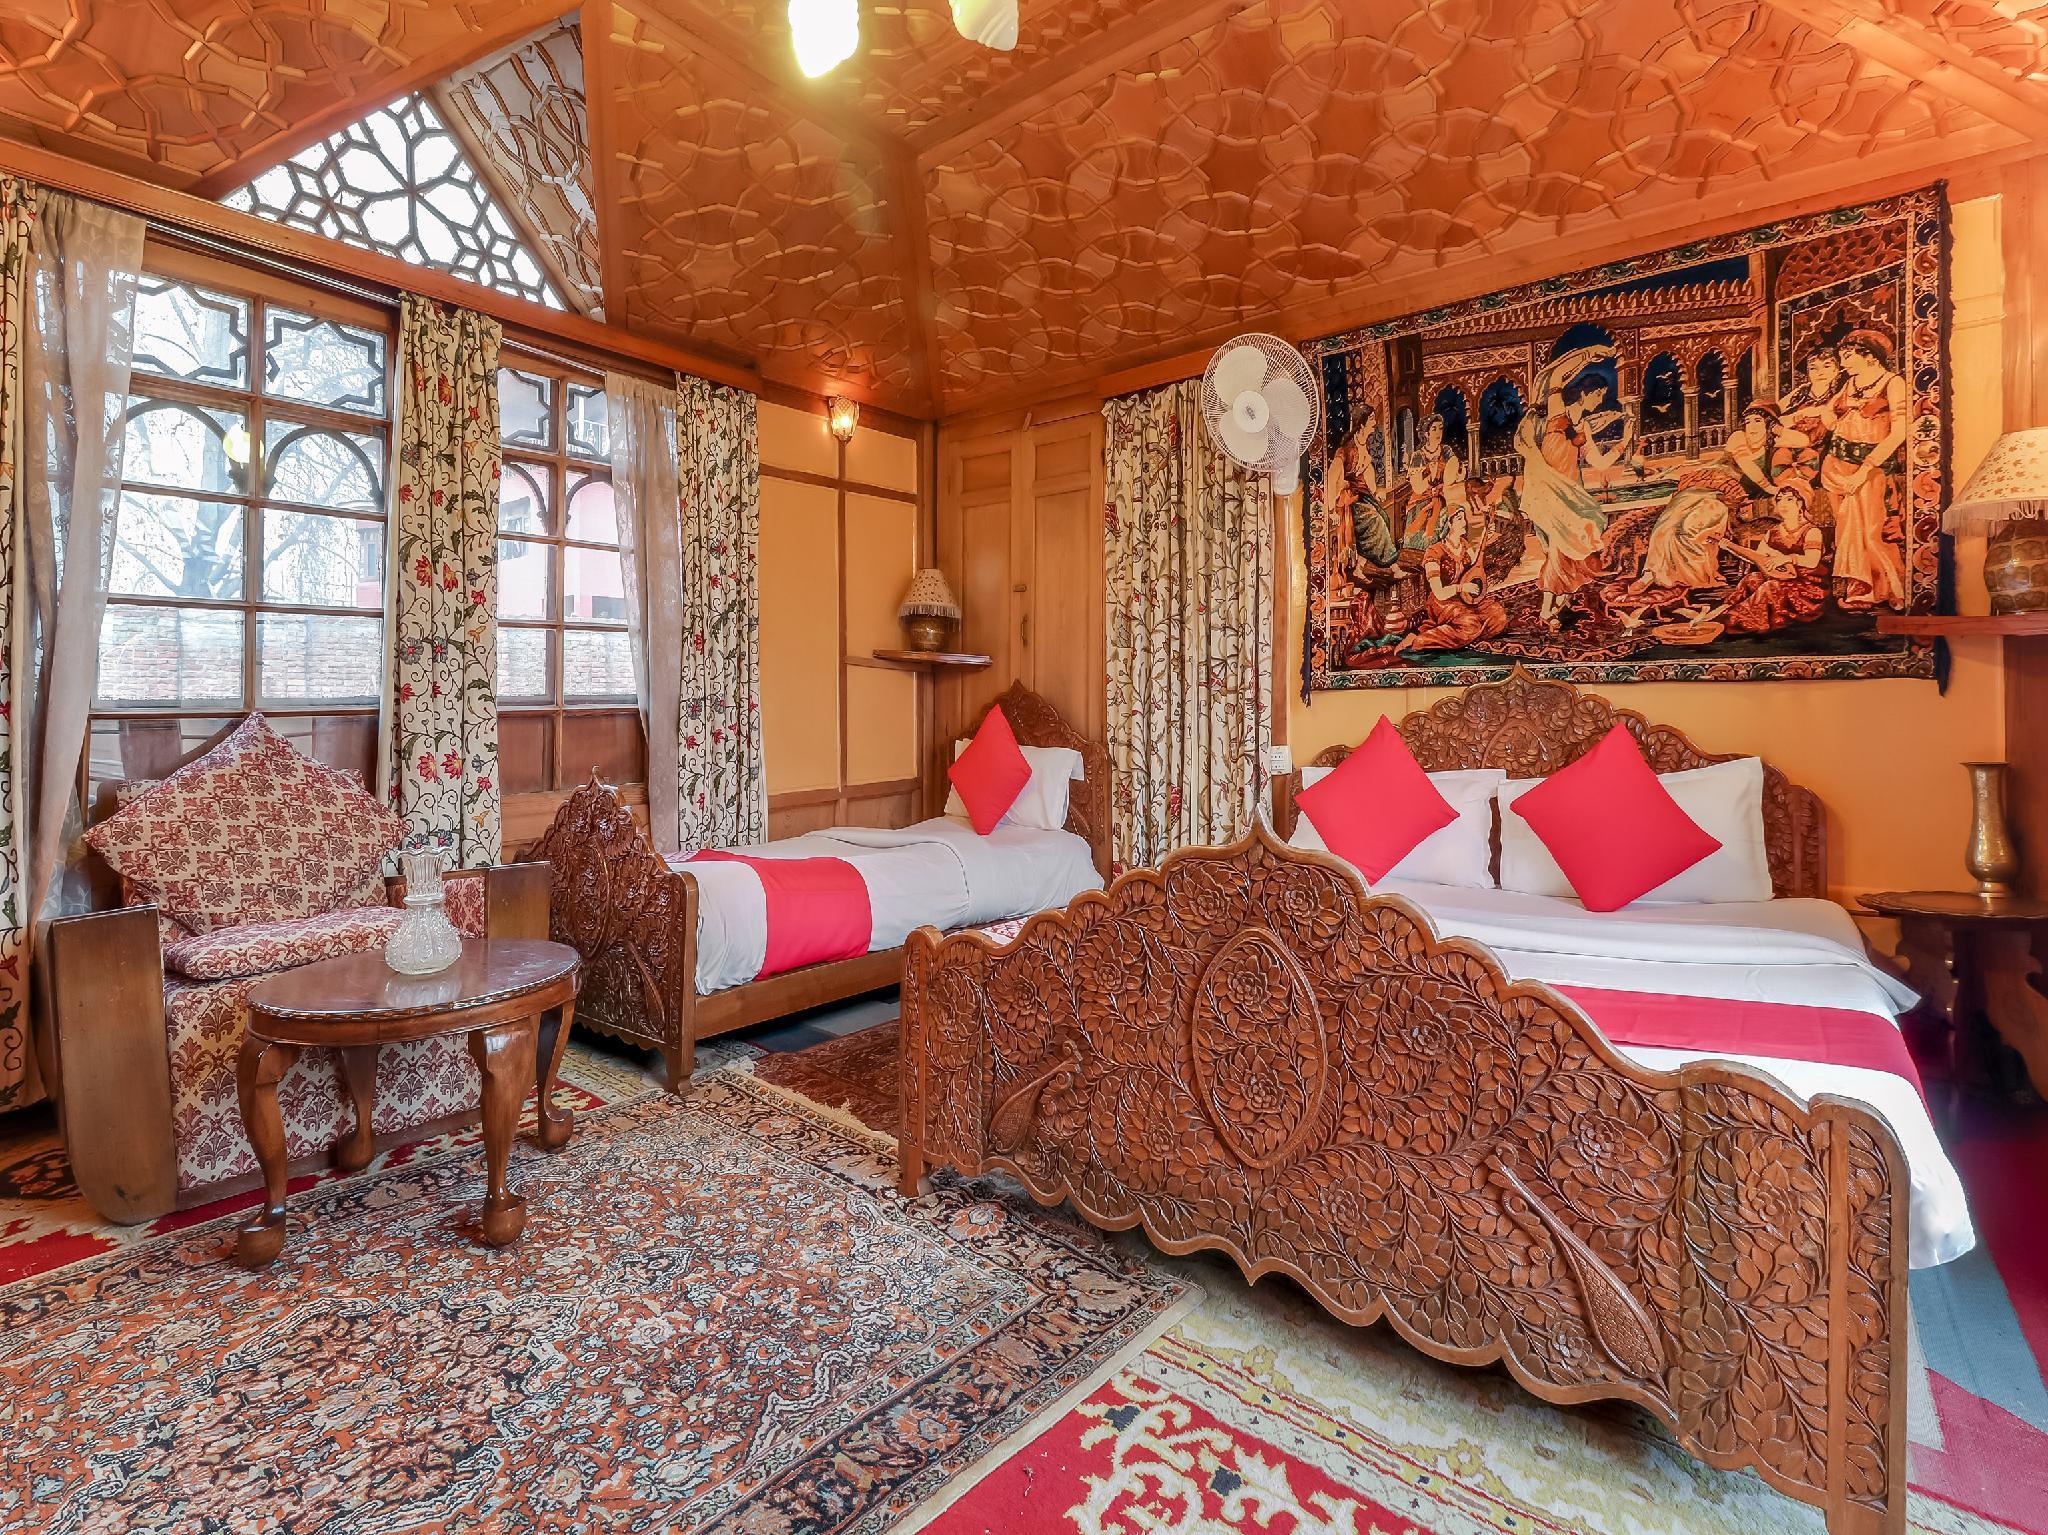 OYO 24812 Kashmir Houseboats By Ats-rooms, Srinagar